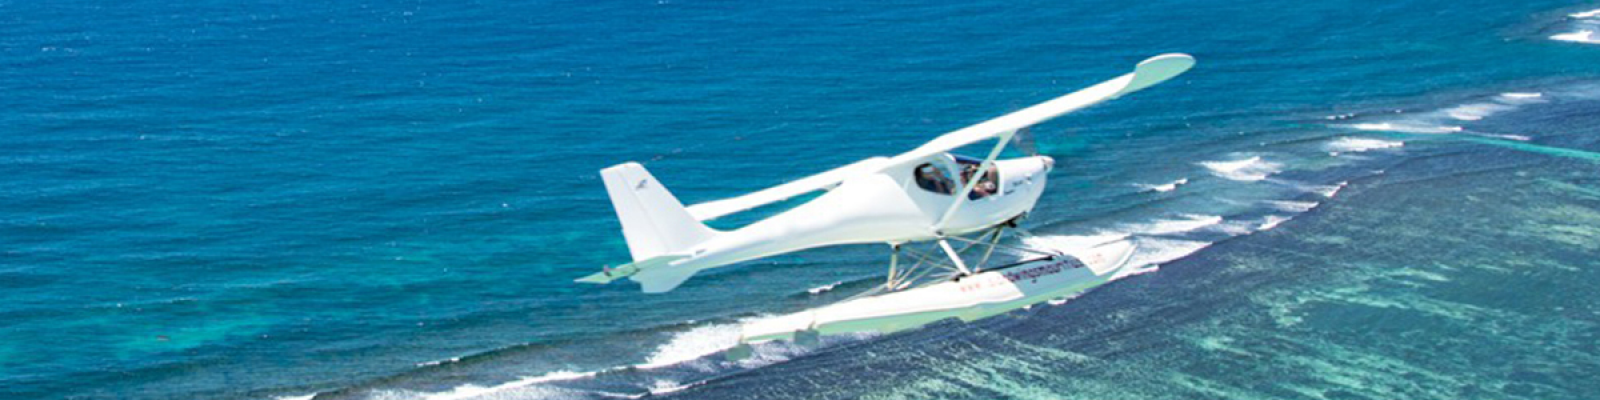 seaplane tour dubai, seaplane dubai offers, seaplane tour dubai deals